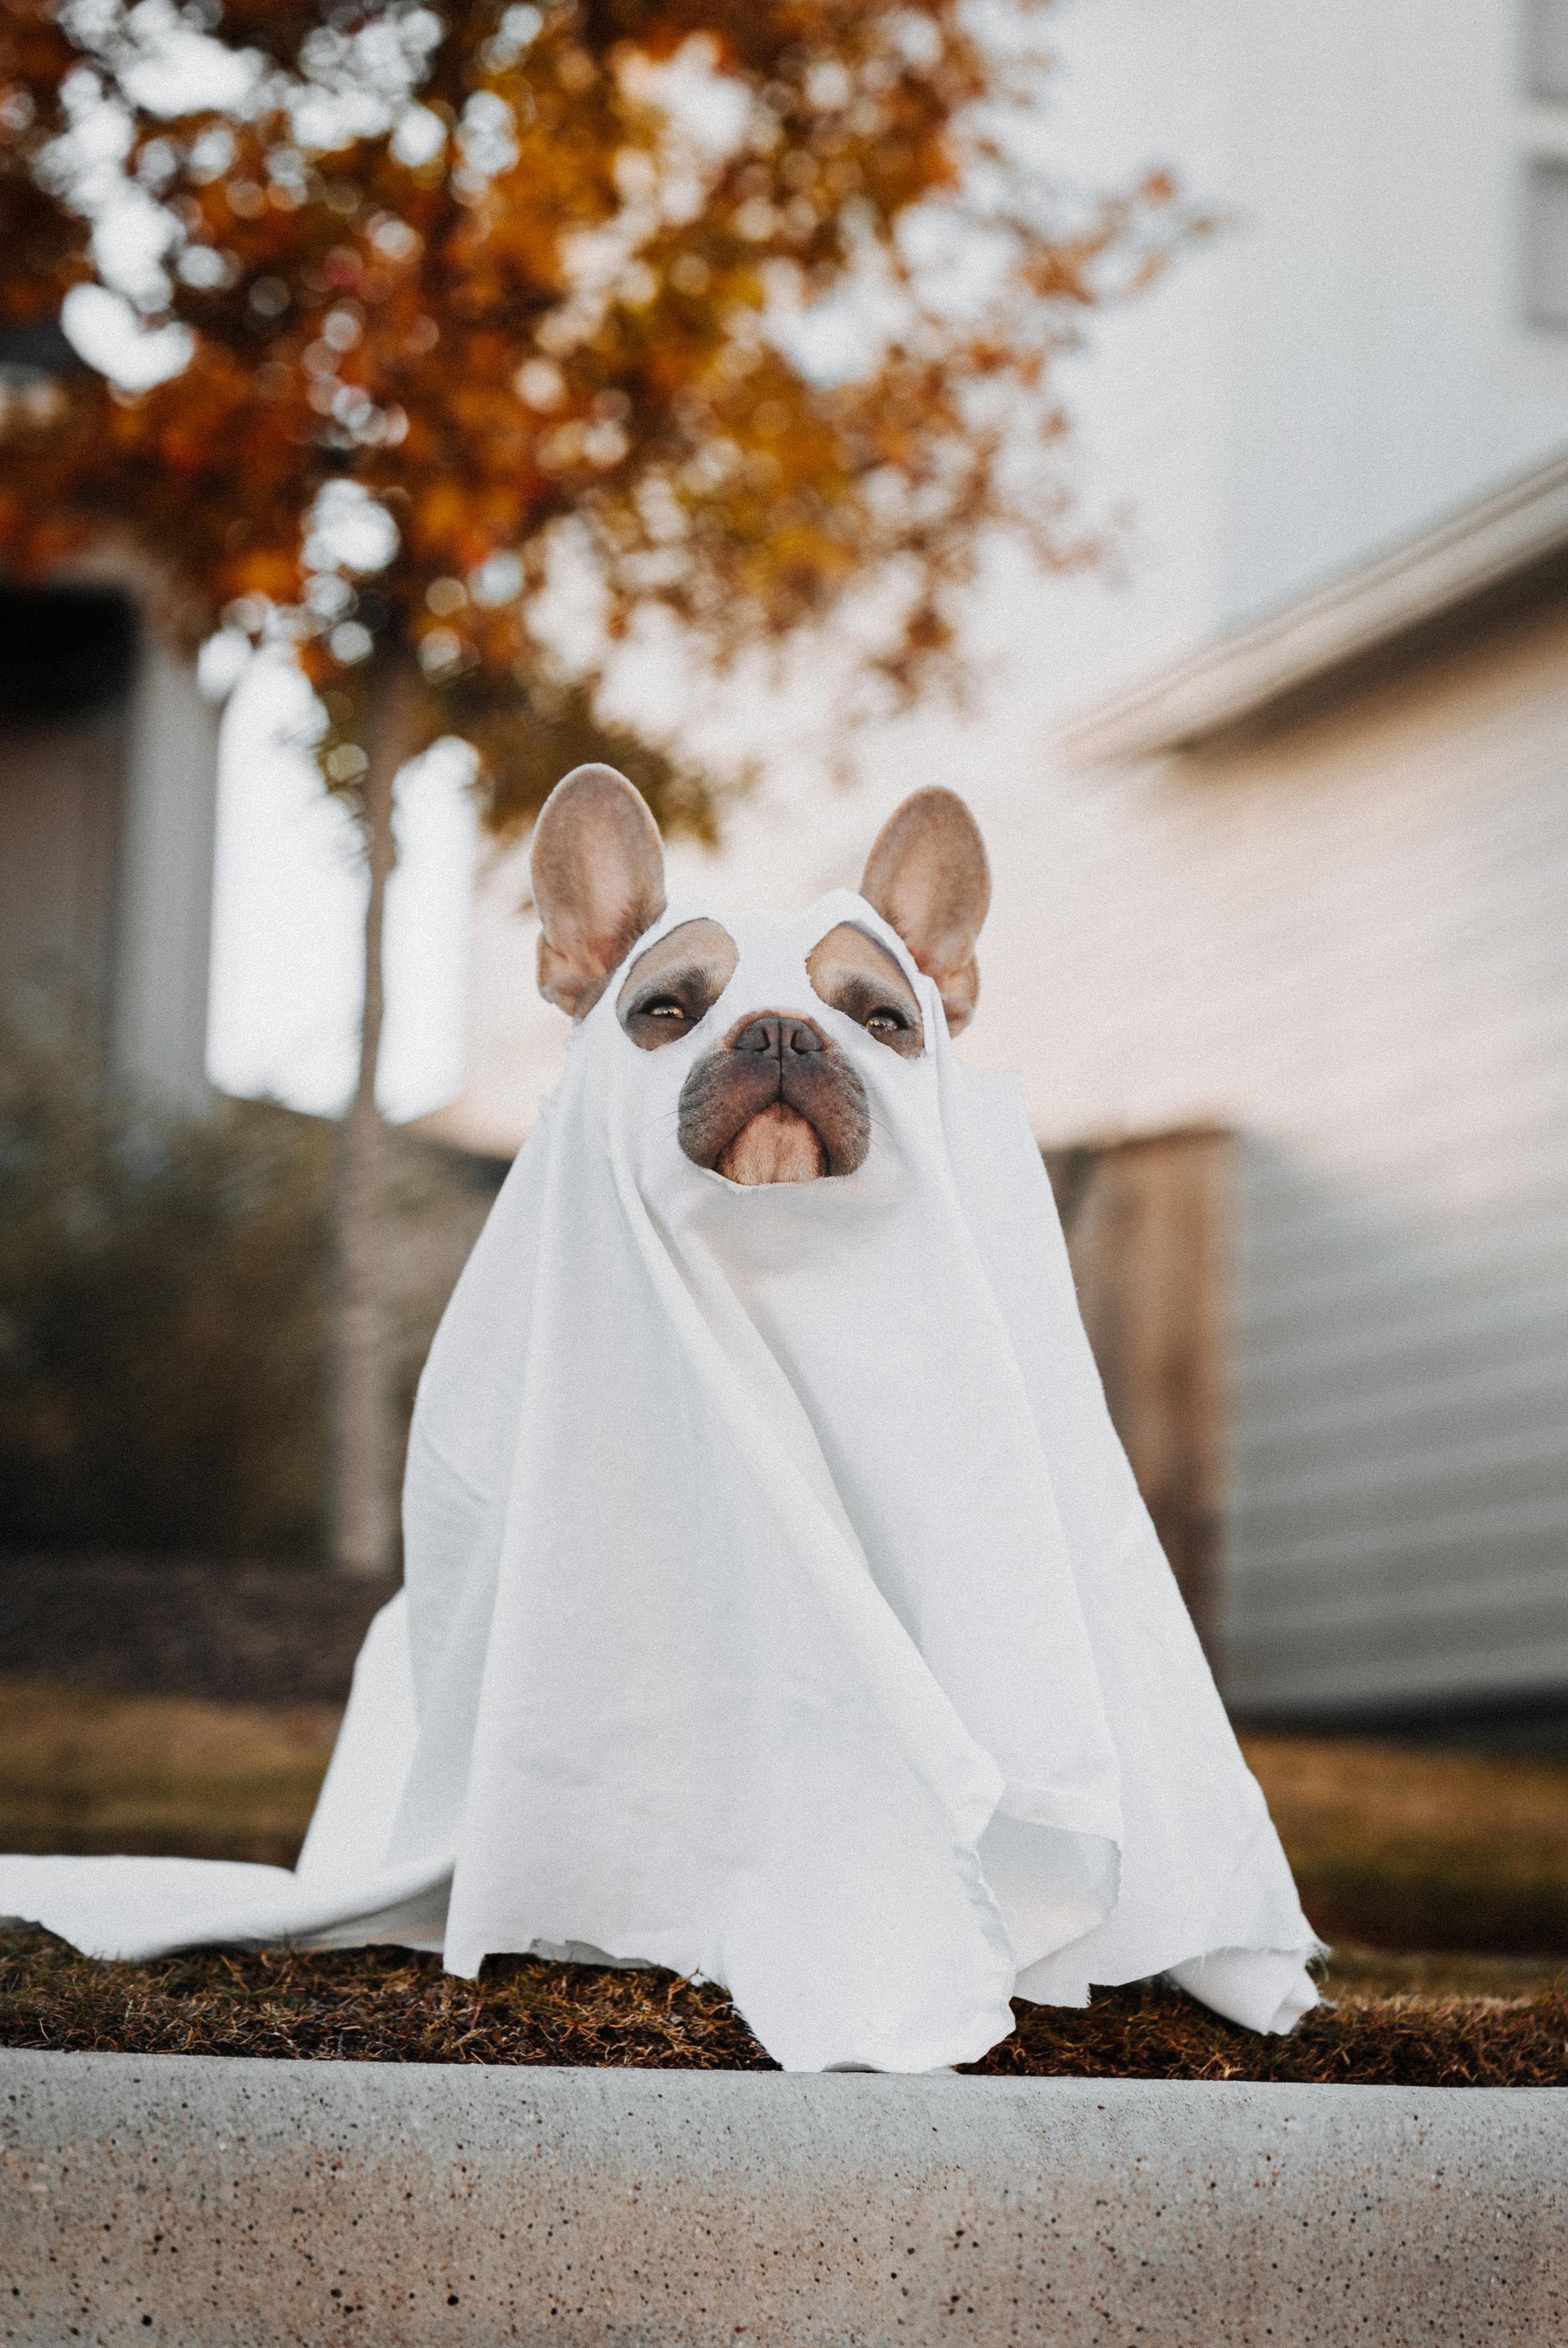 Pet Costume Ideas for Halloween 2021-image